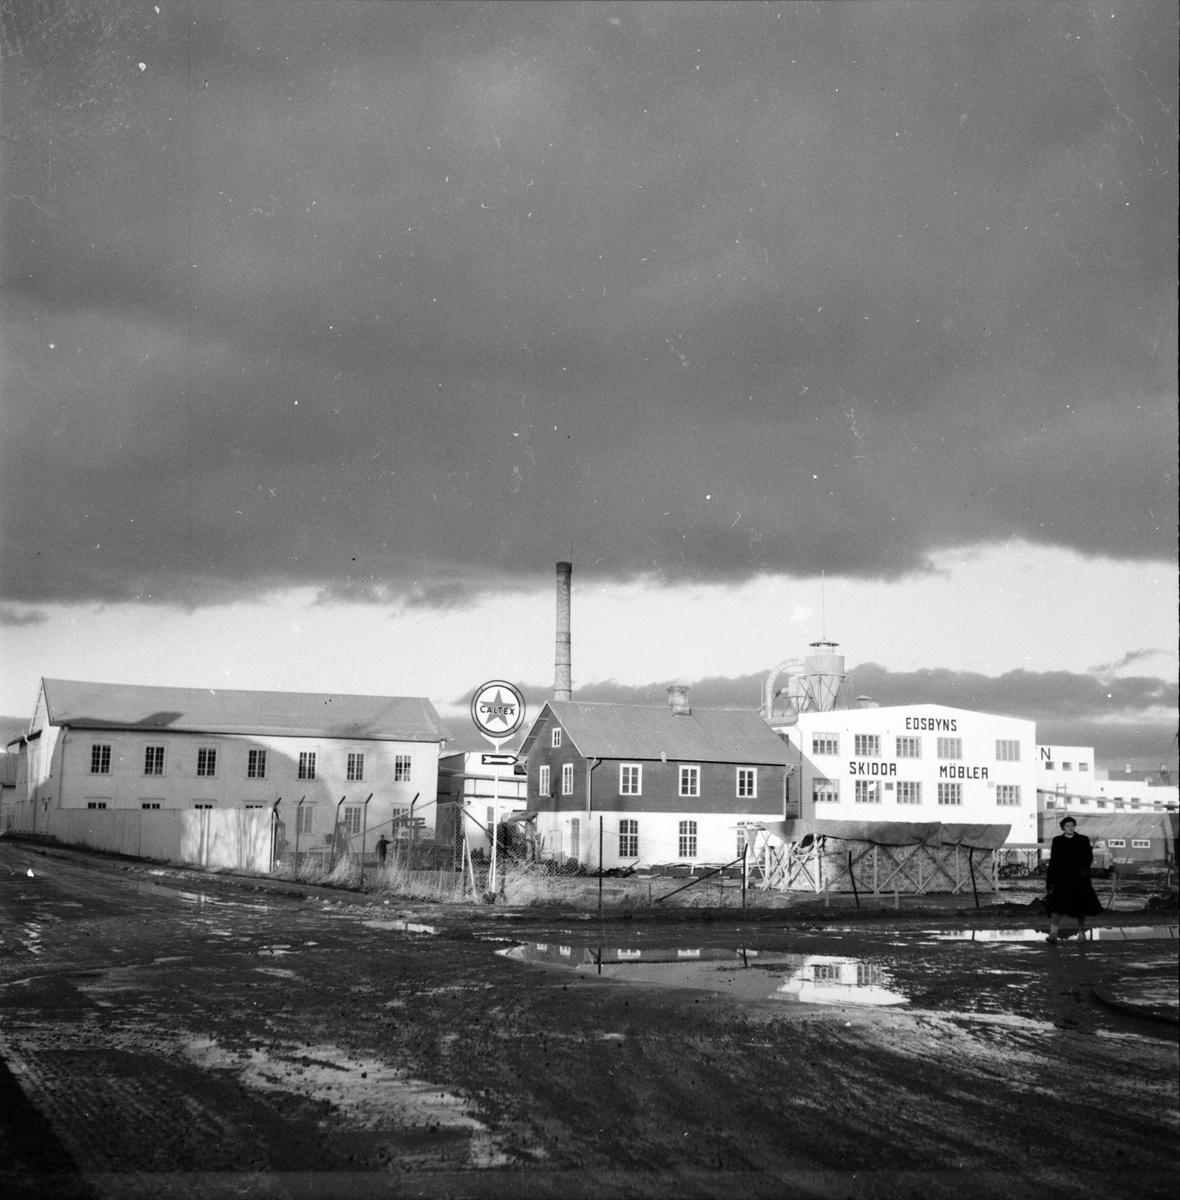 Ljusnan, Edsby-bilder